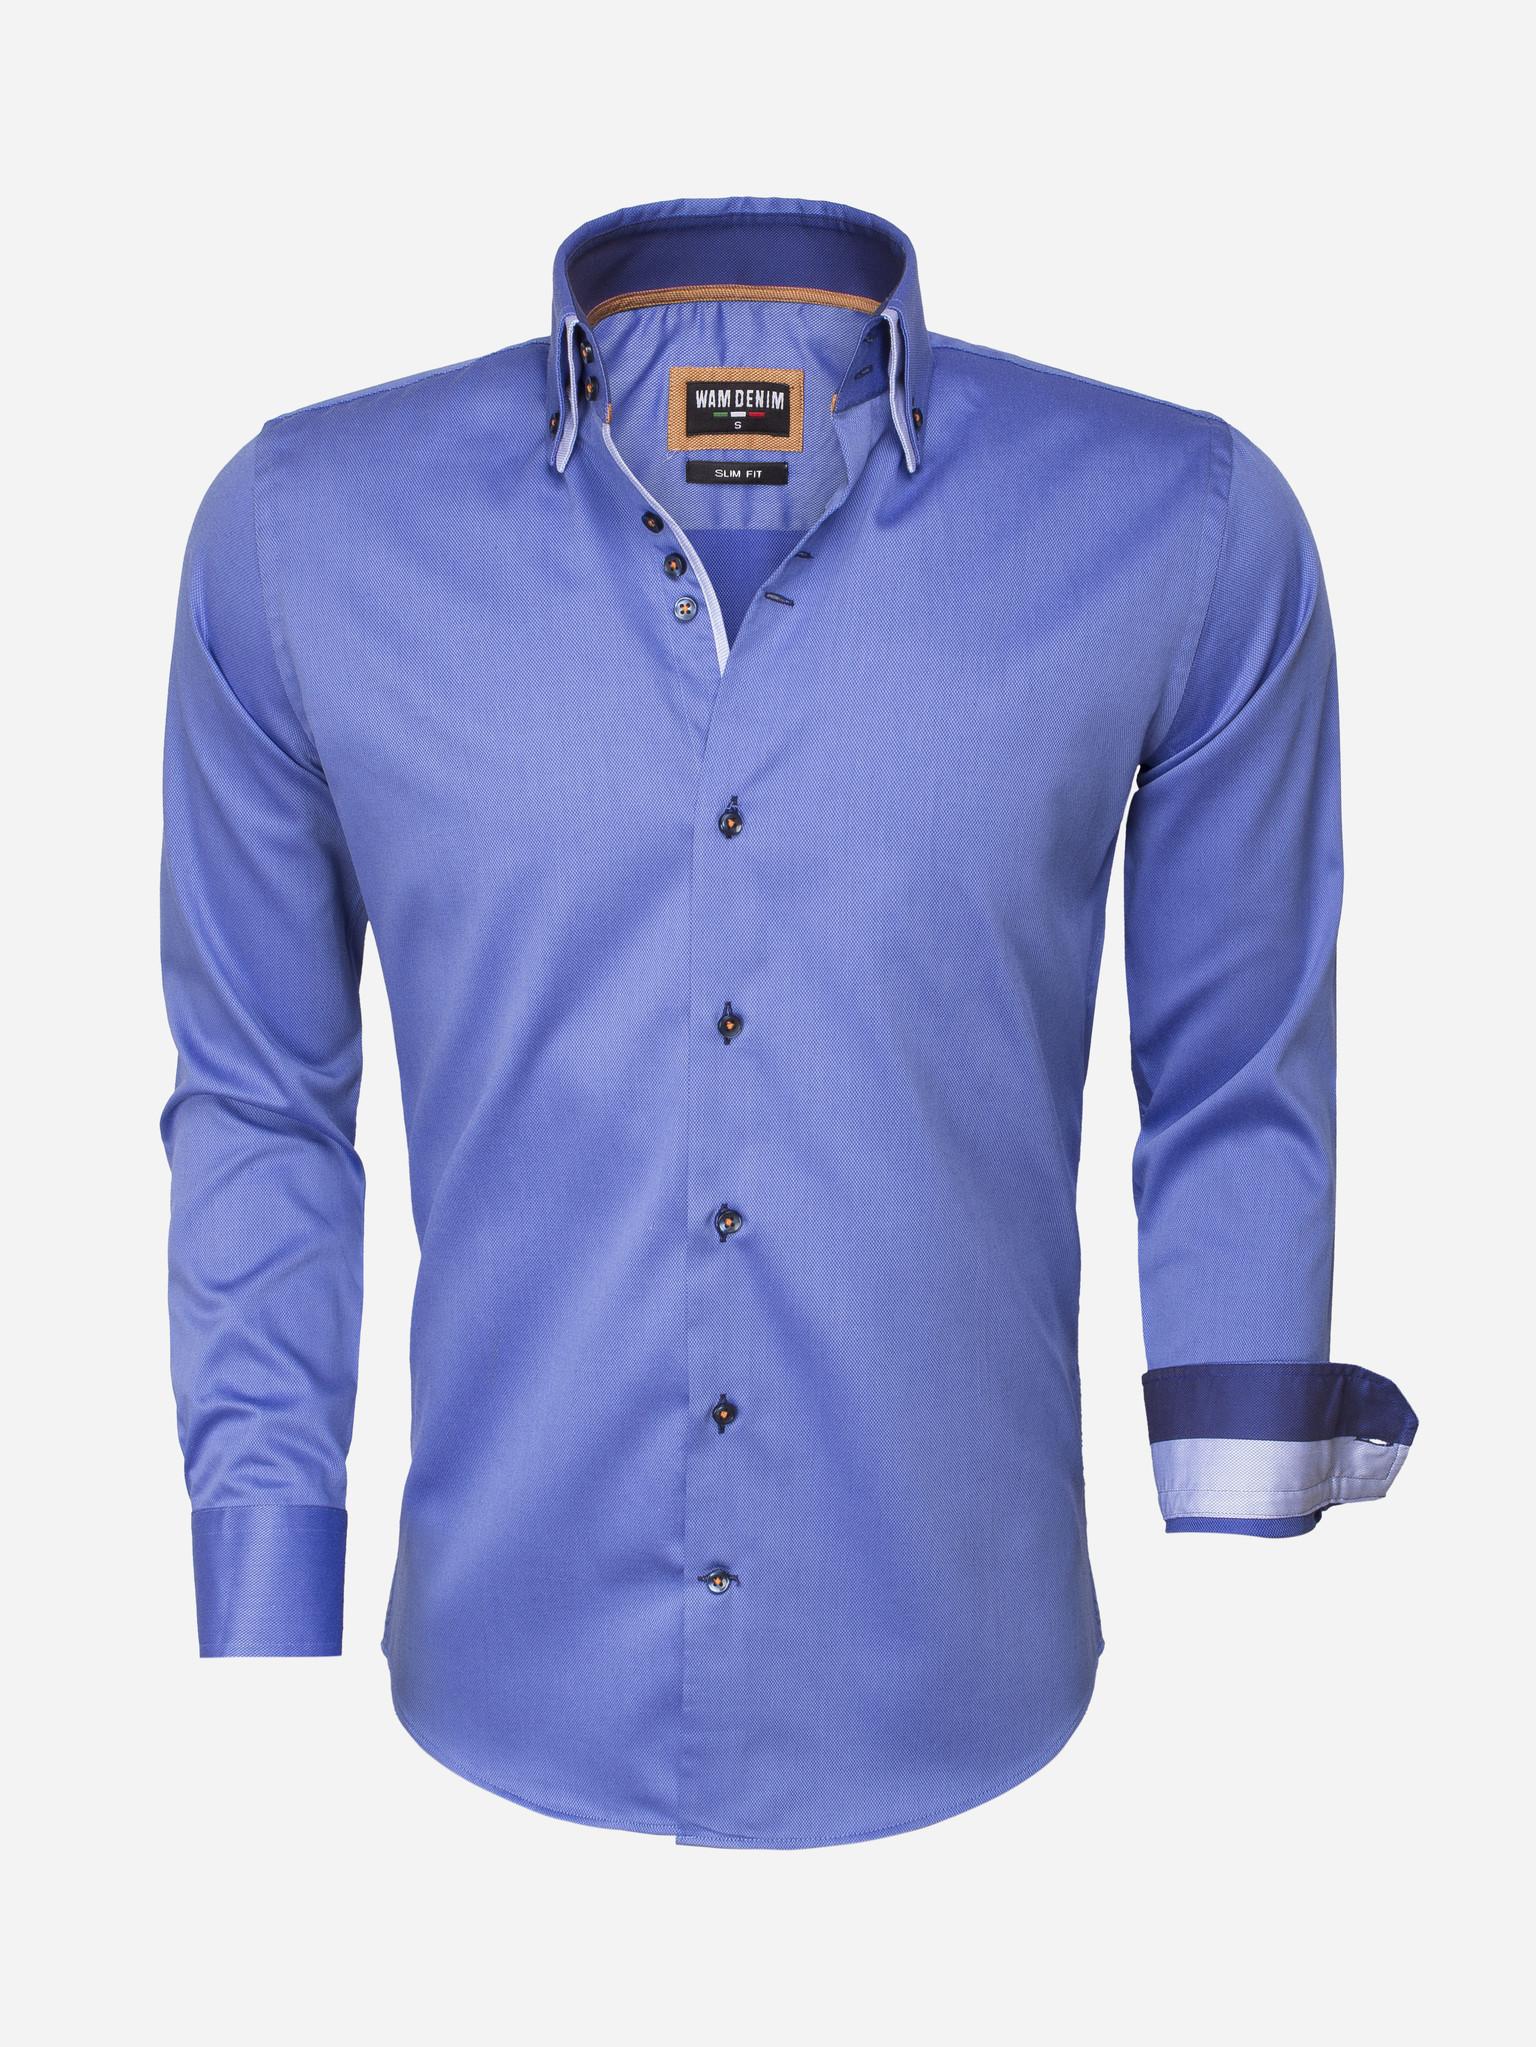 Wam Denim Overhemd Lange Mouw  Maat: 2XL